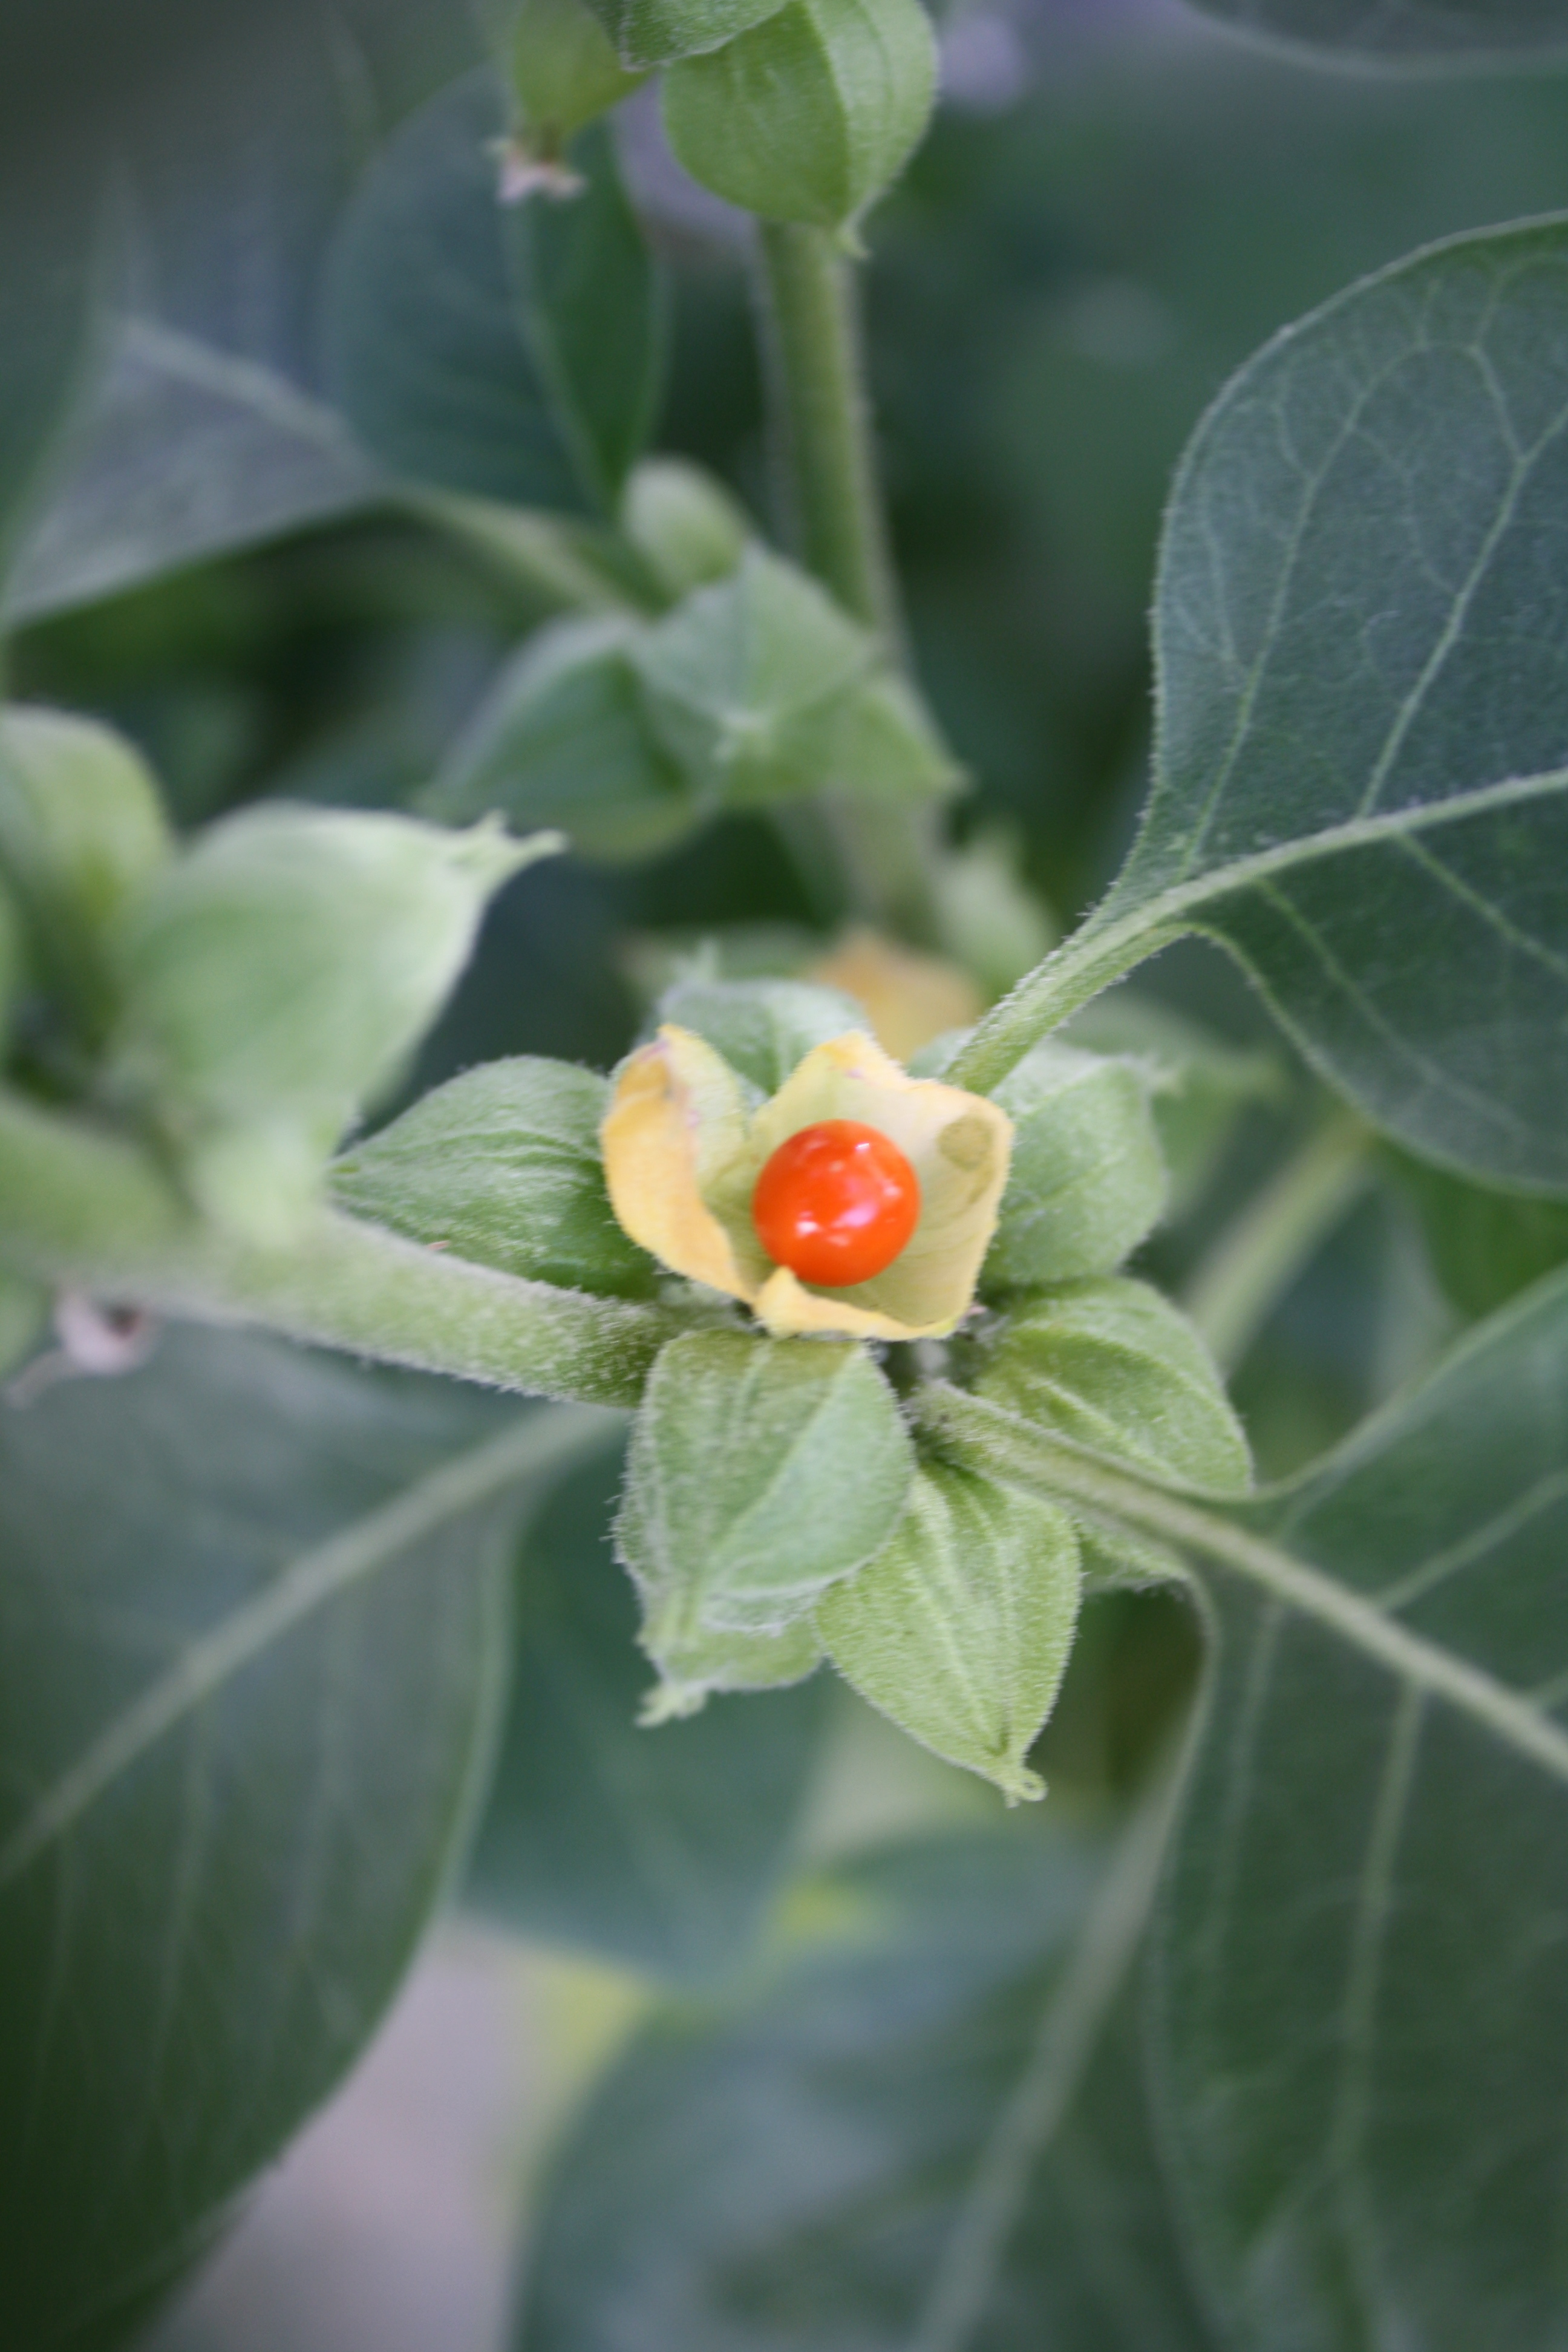 Ašvaganda (psáno rovněž ašwaganda, botanický název witánie snodárná, lat. Withania somnifera)  autor: Wowbobwow12